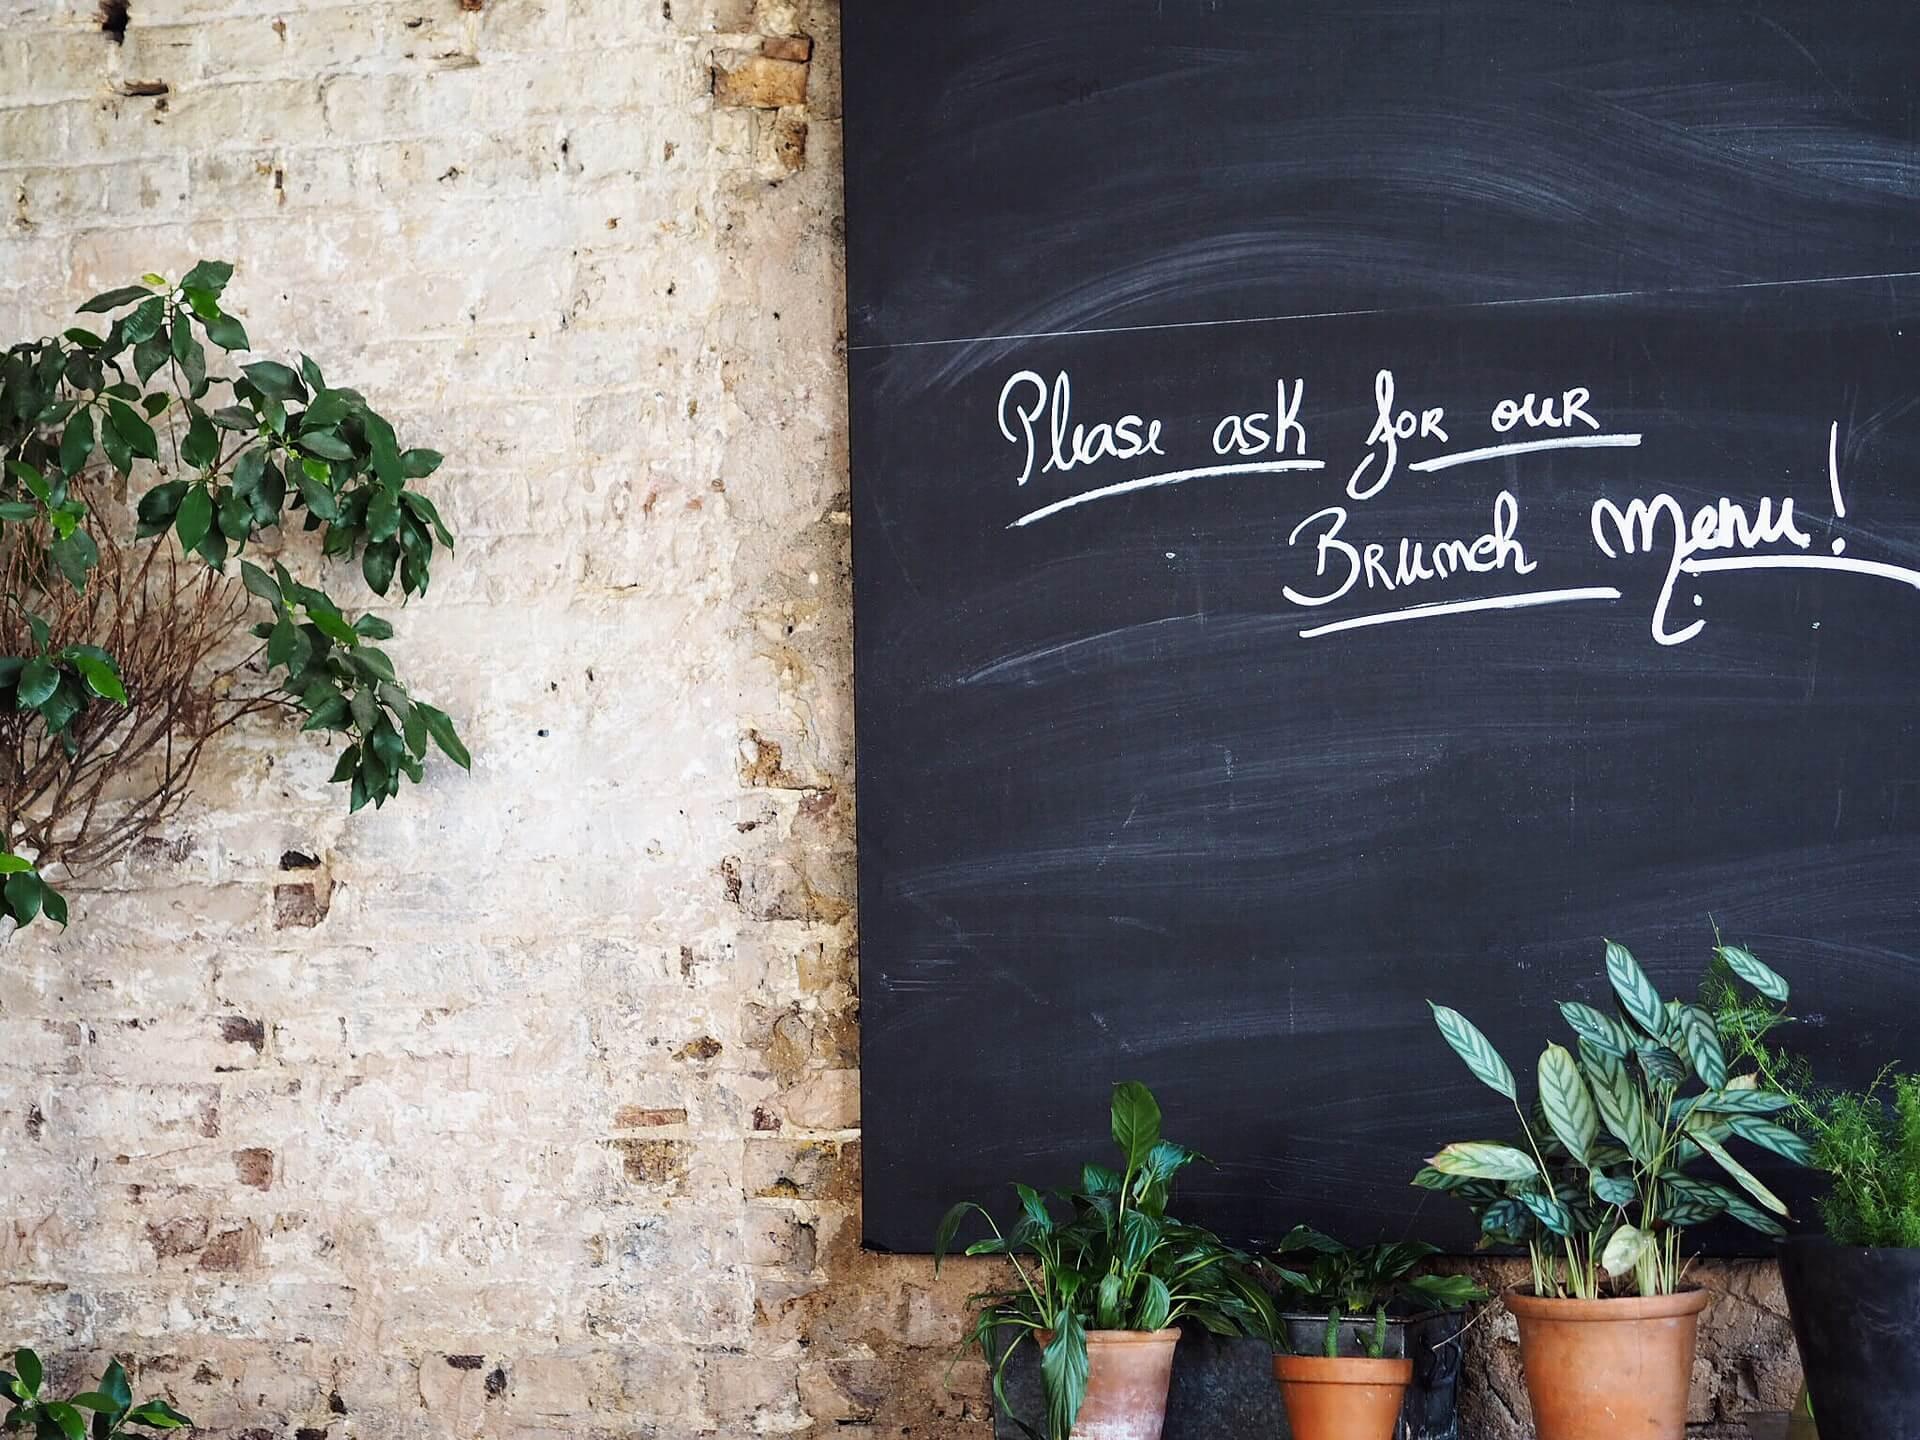 Please ask for our brunch menu chalk restaurant sign